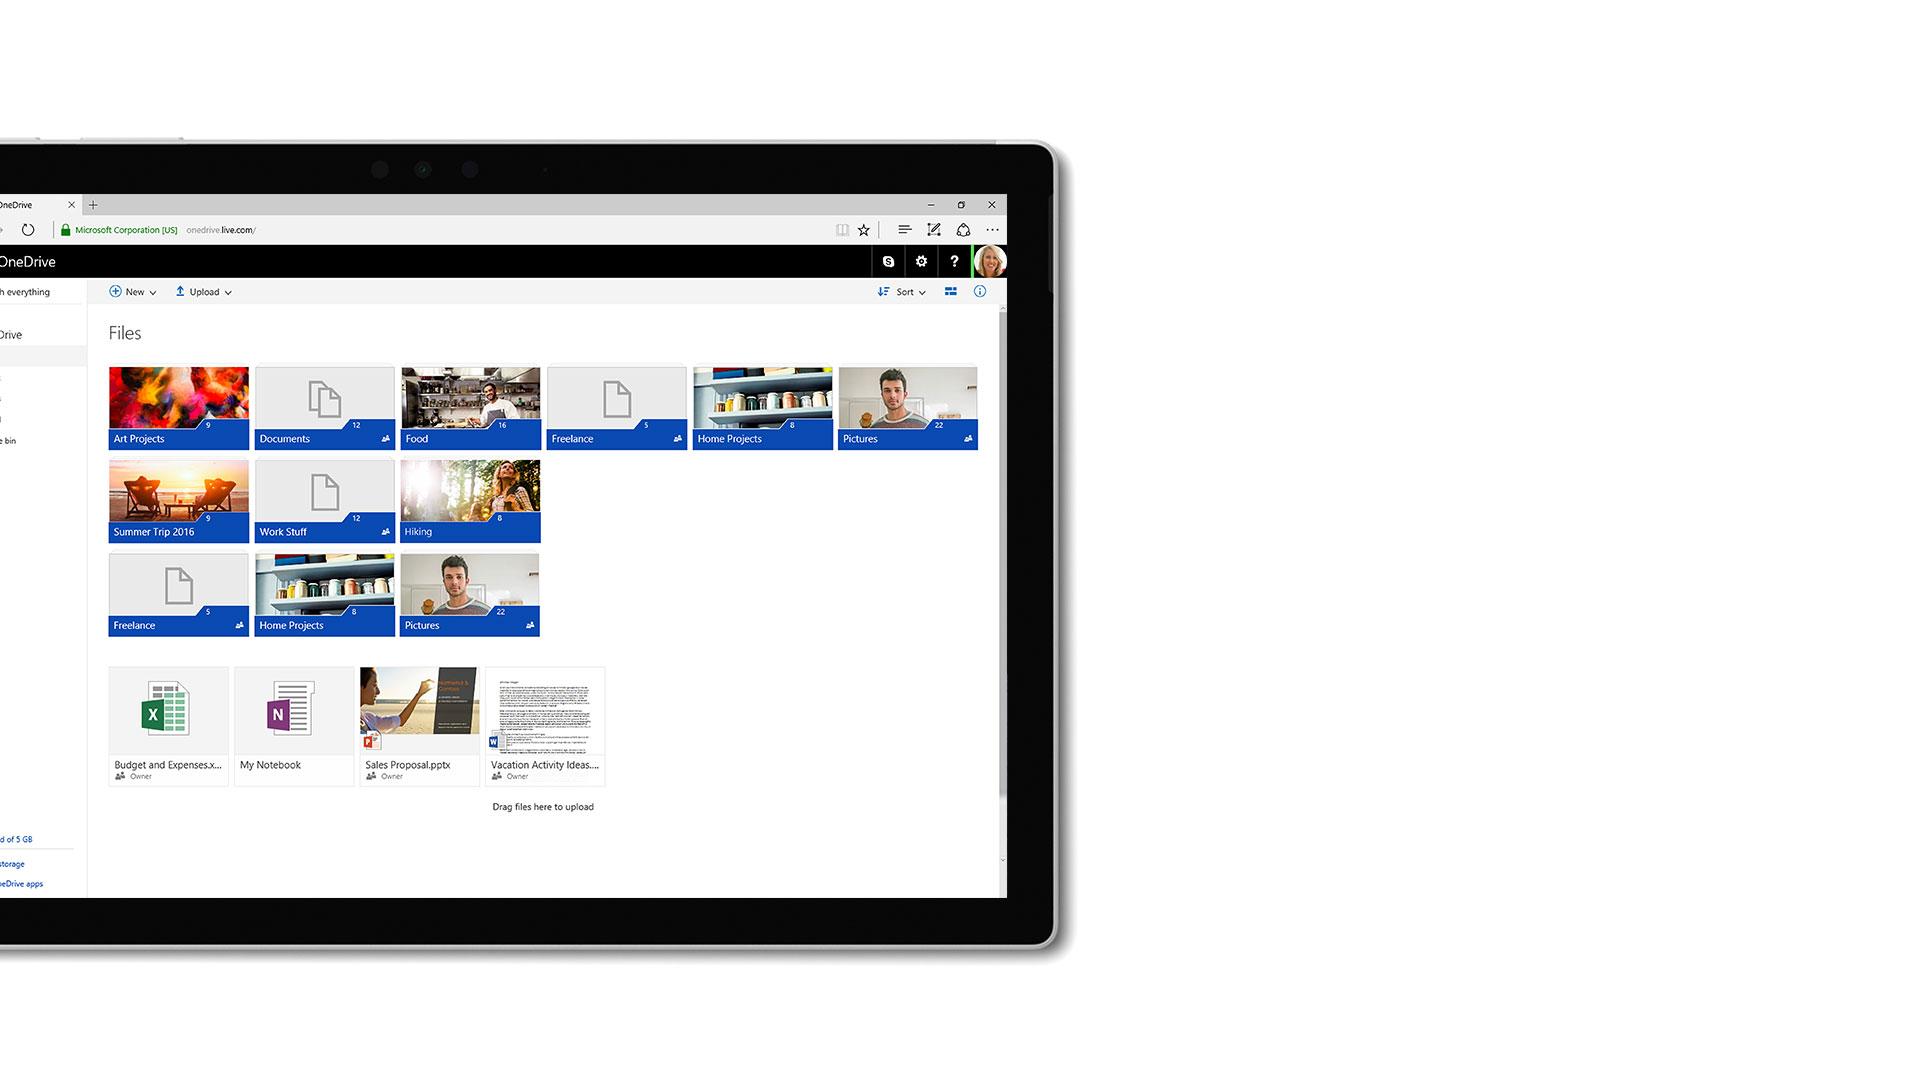 Image de l'interface utilisateur de Microsoft OneDrive